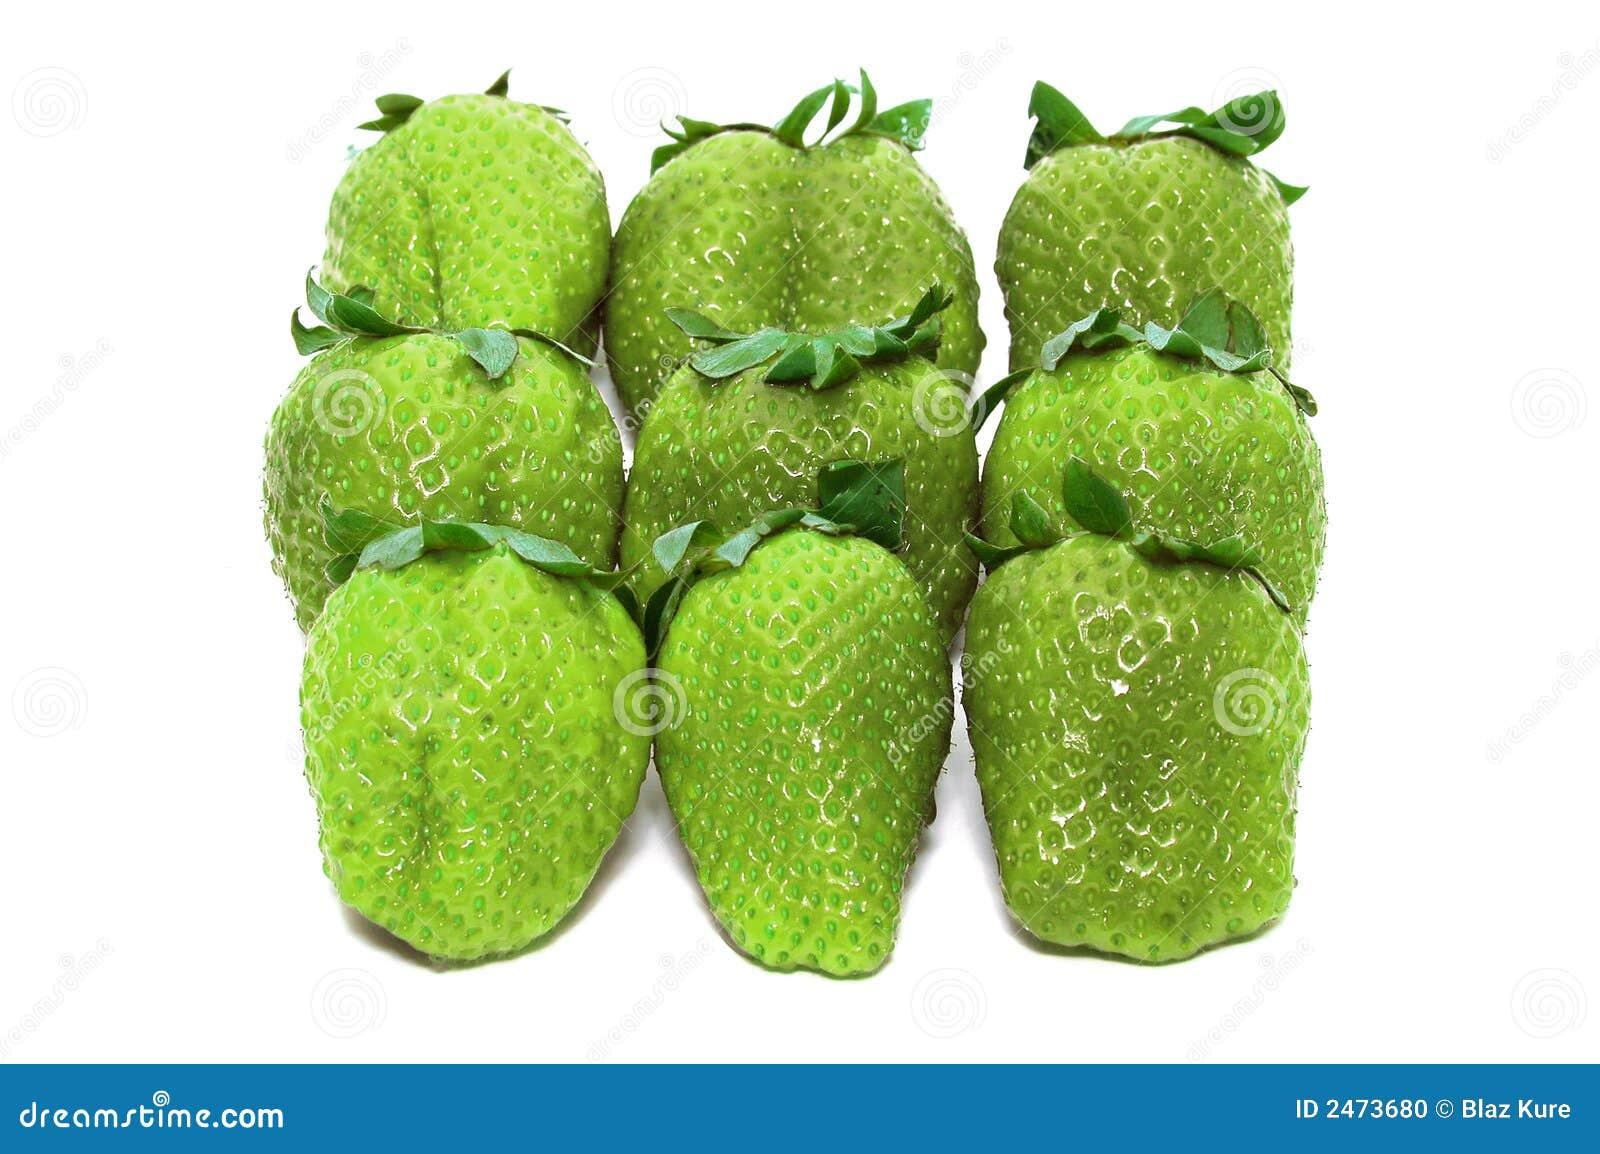 Unripe Strawberries Green Unripe St...